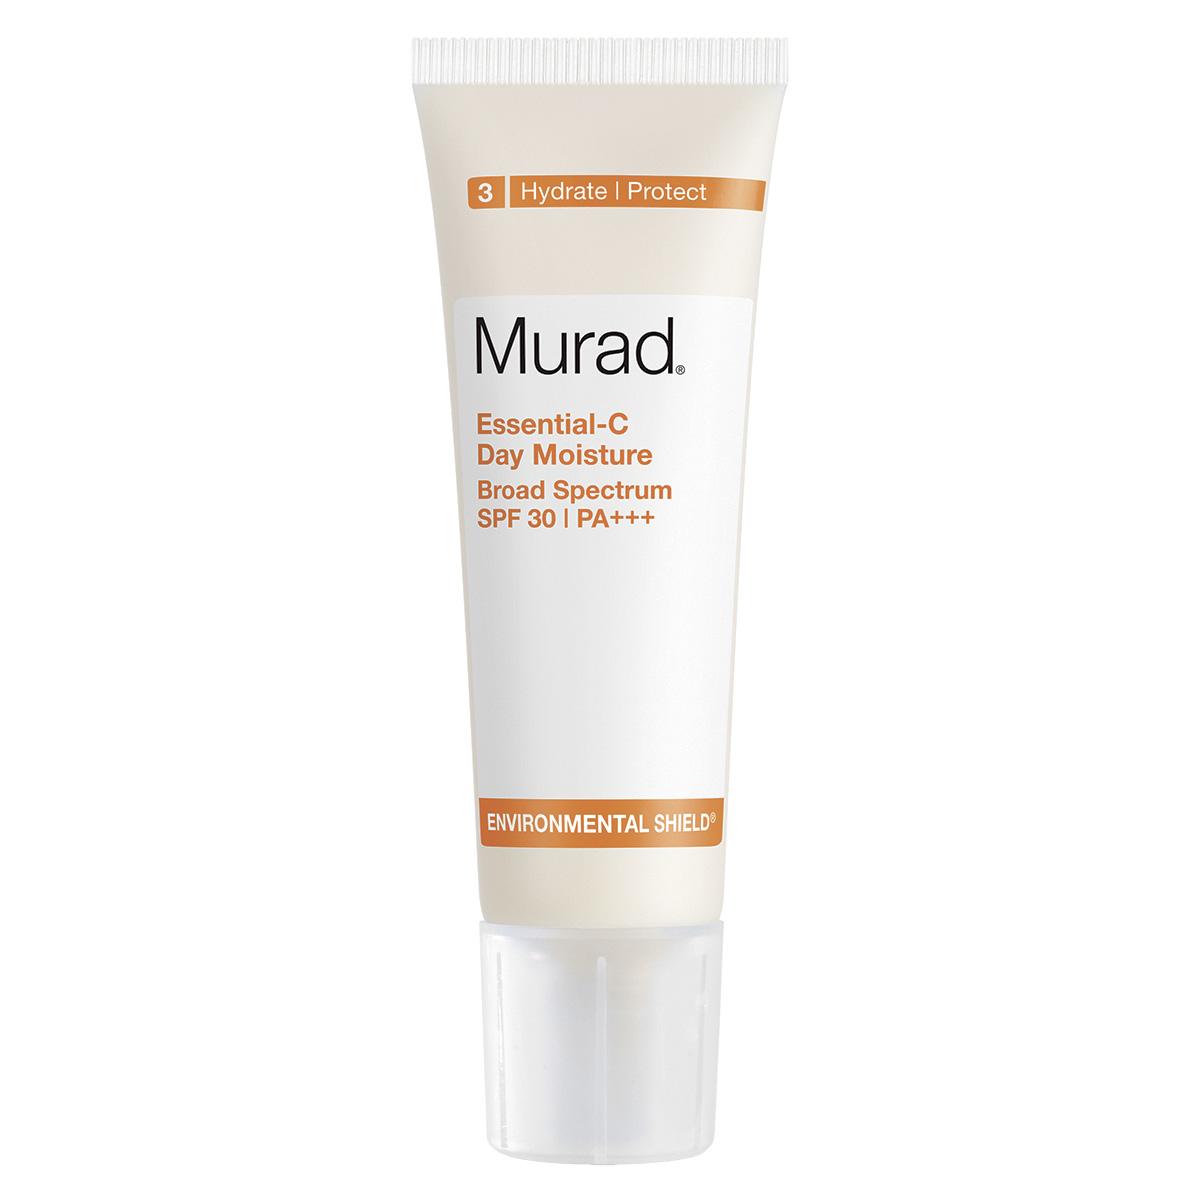 Billede af Murad Enviromental Shield Essential-C Day Moisture SPF 30 - 50 ml